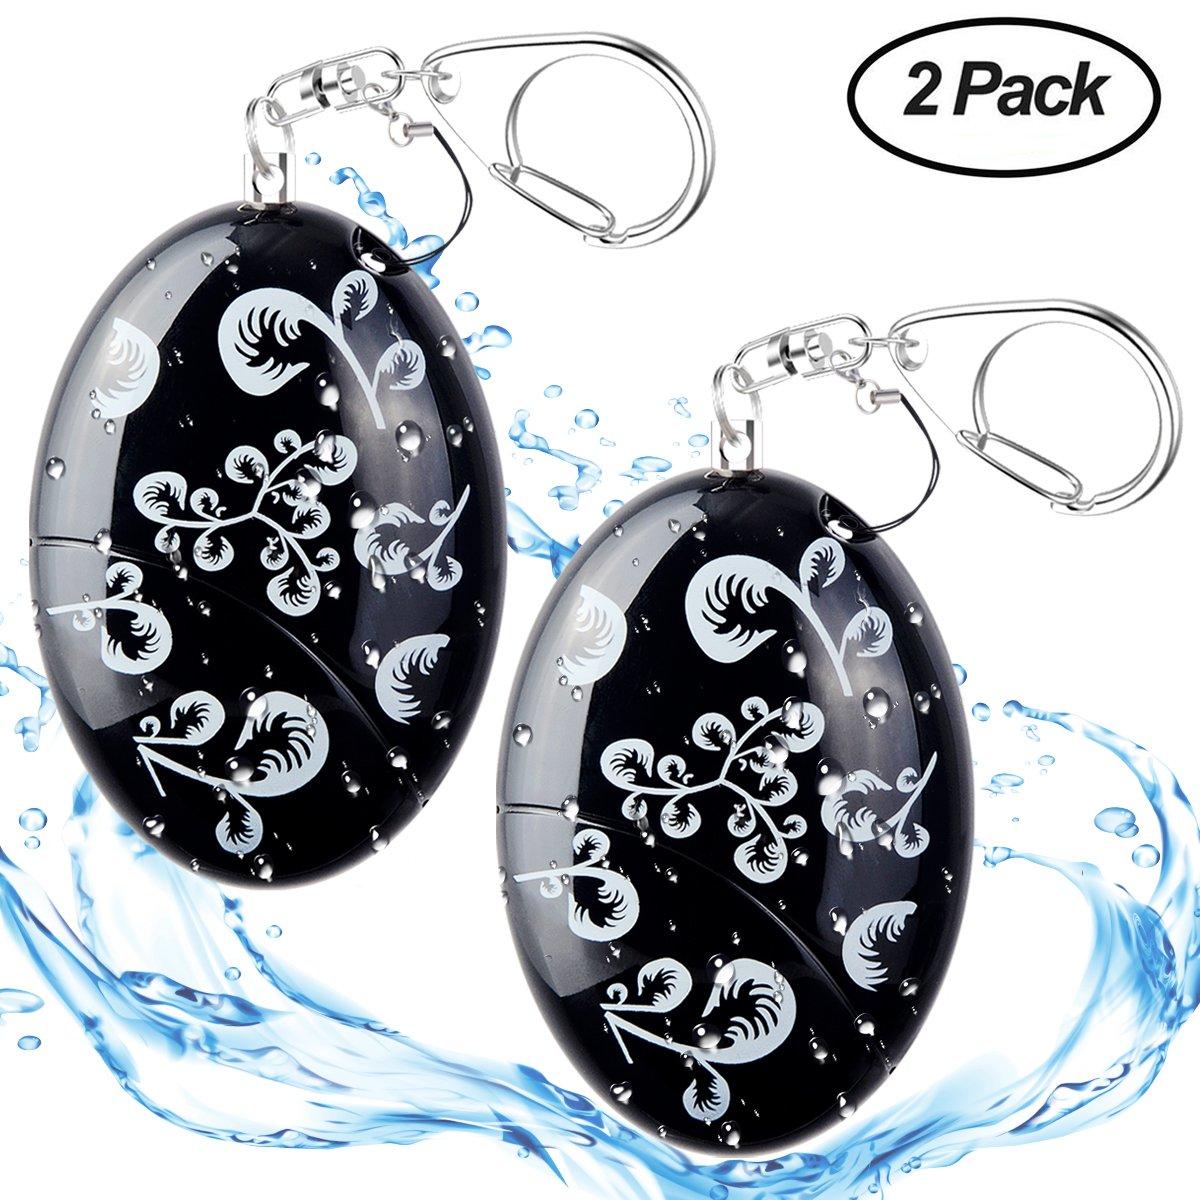 ASTUBIA Personal Alarm Keychain [Water-Proof] 120DB Self-Defense Emergency Sound Siren Safe Song Alarm for Women Kids Elderly Superior Explorer -2 Pack